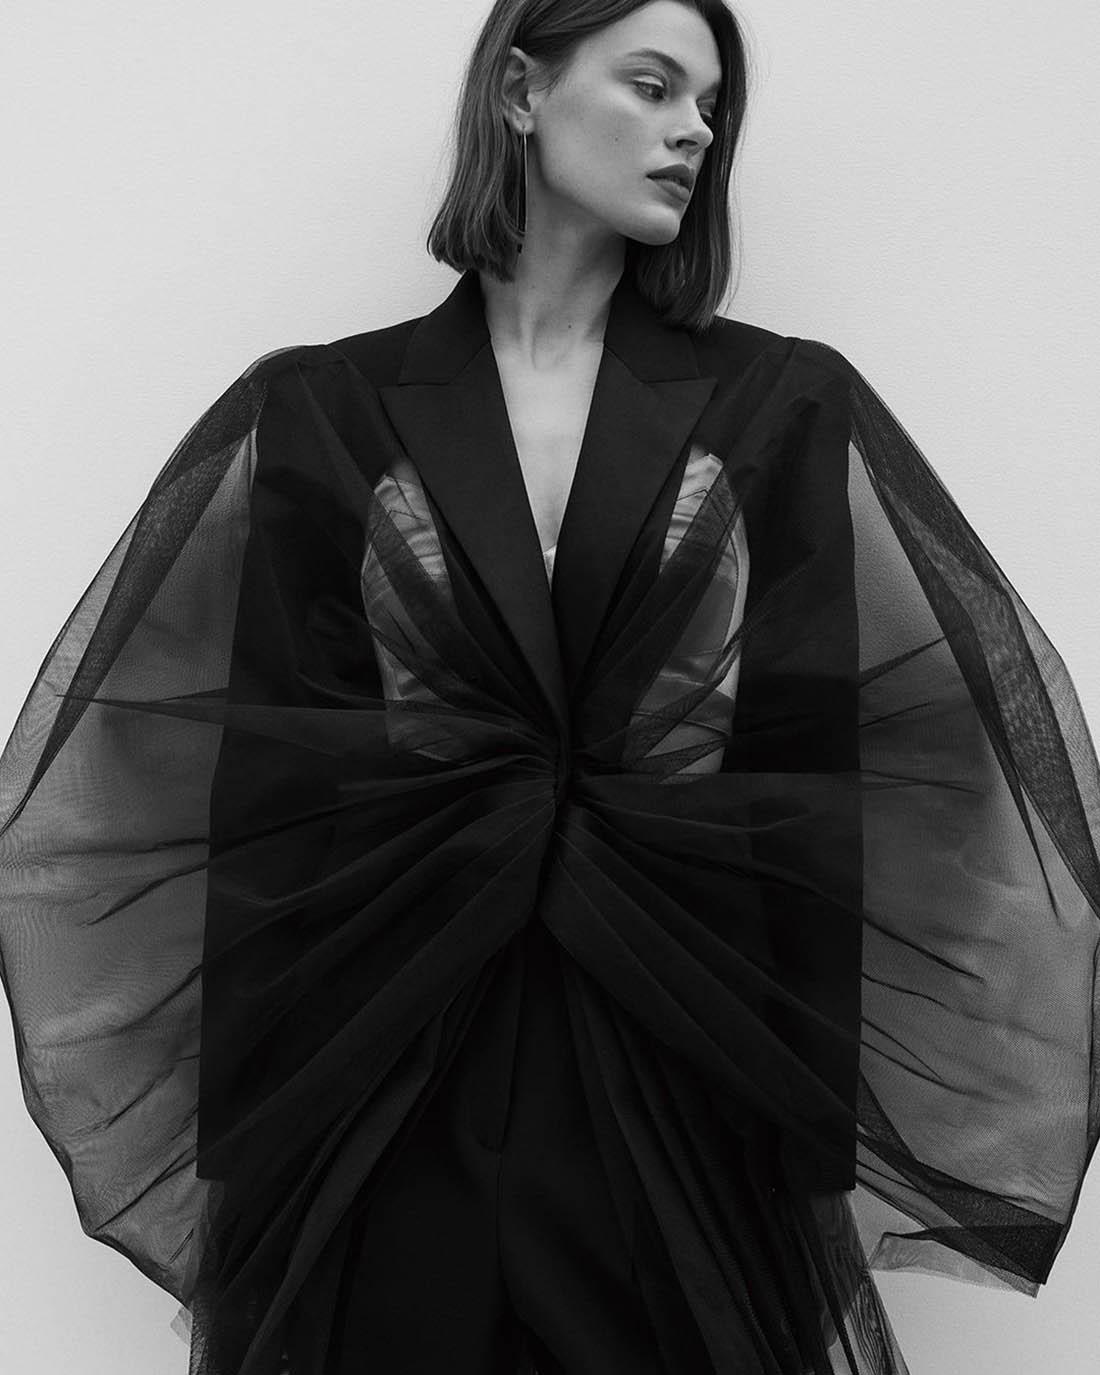 Cara Taylor by Thomas Slack for Vogue China February 2021